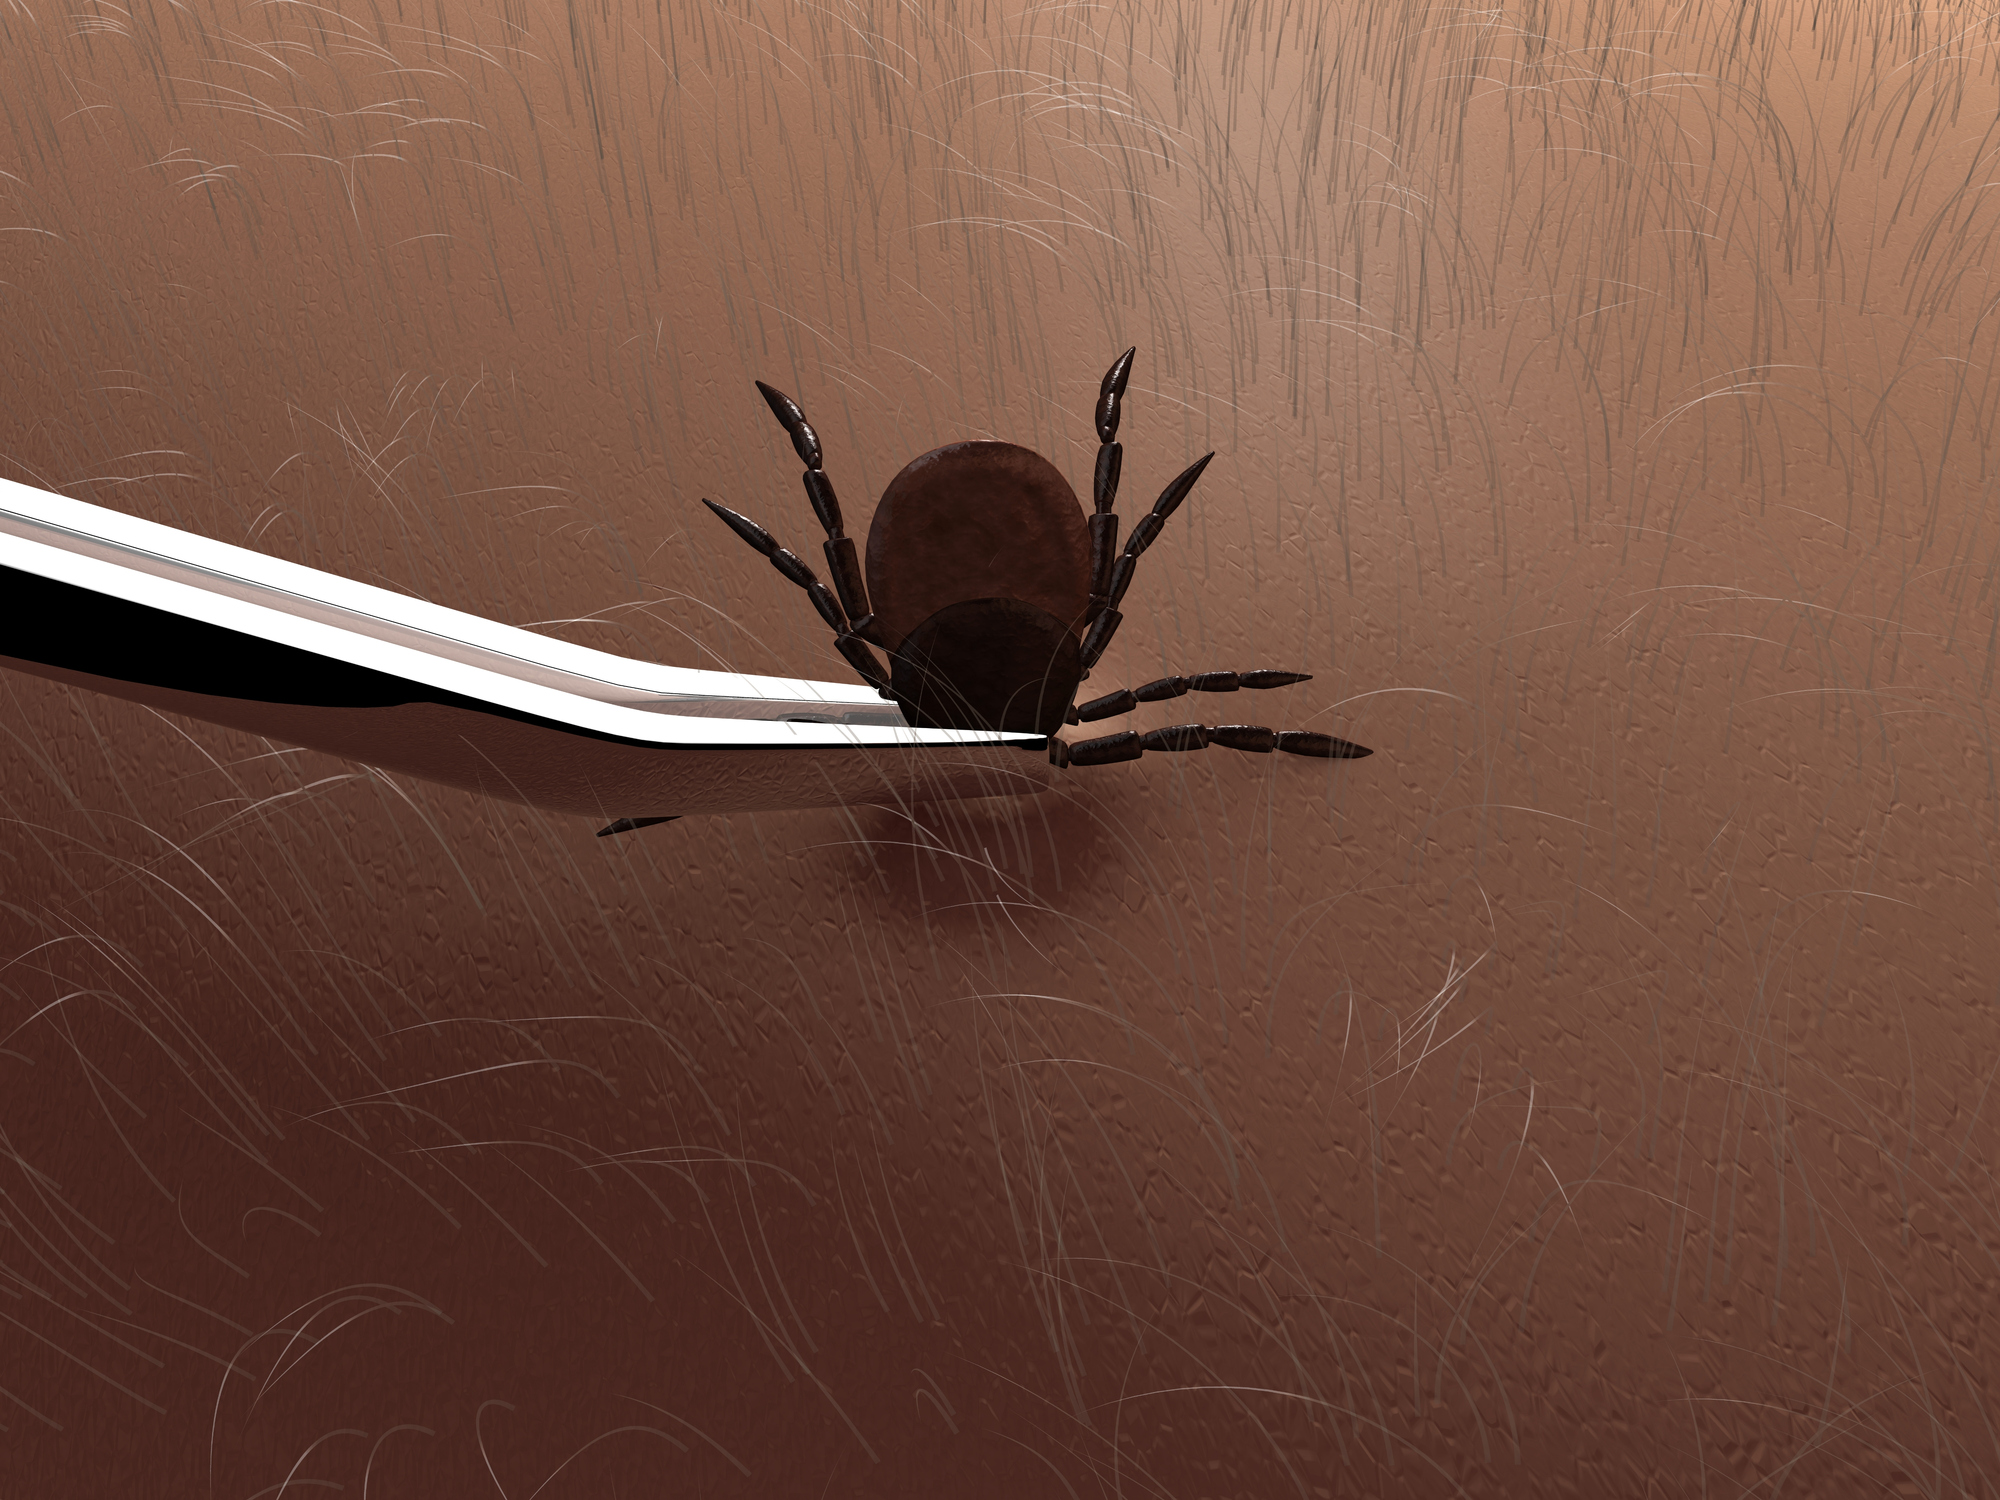 Use tweezers to remove ticks.